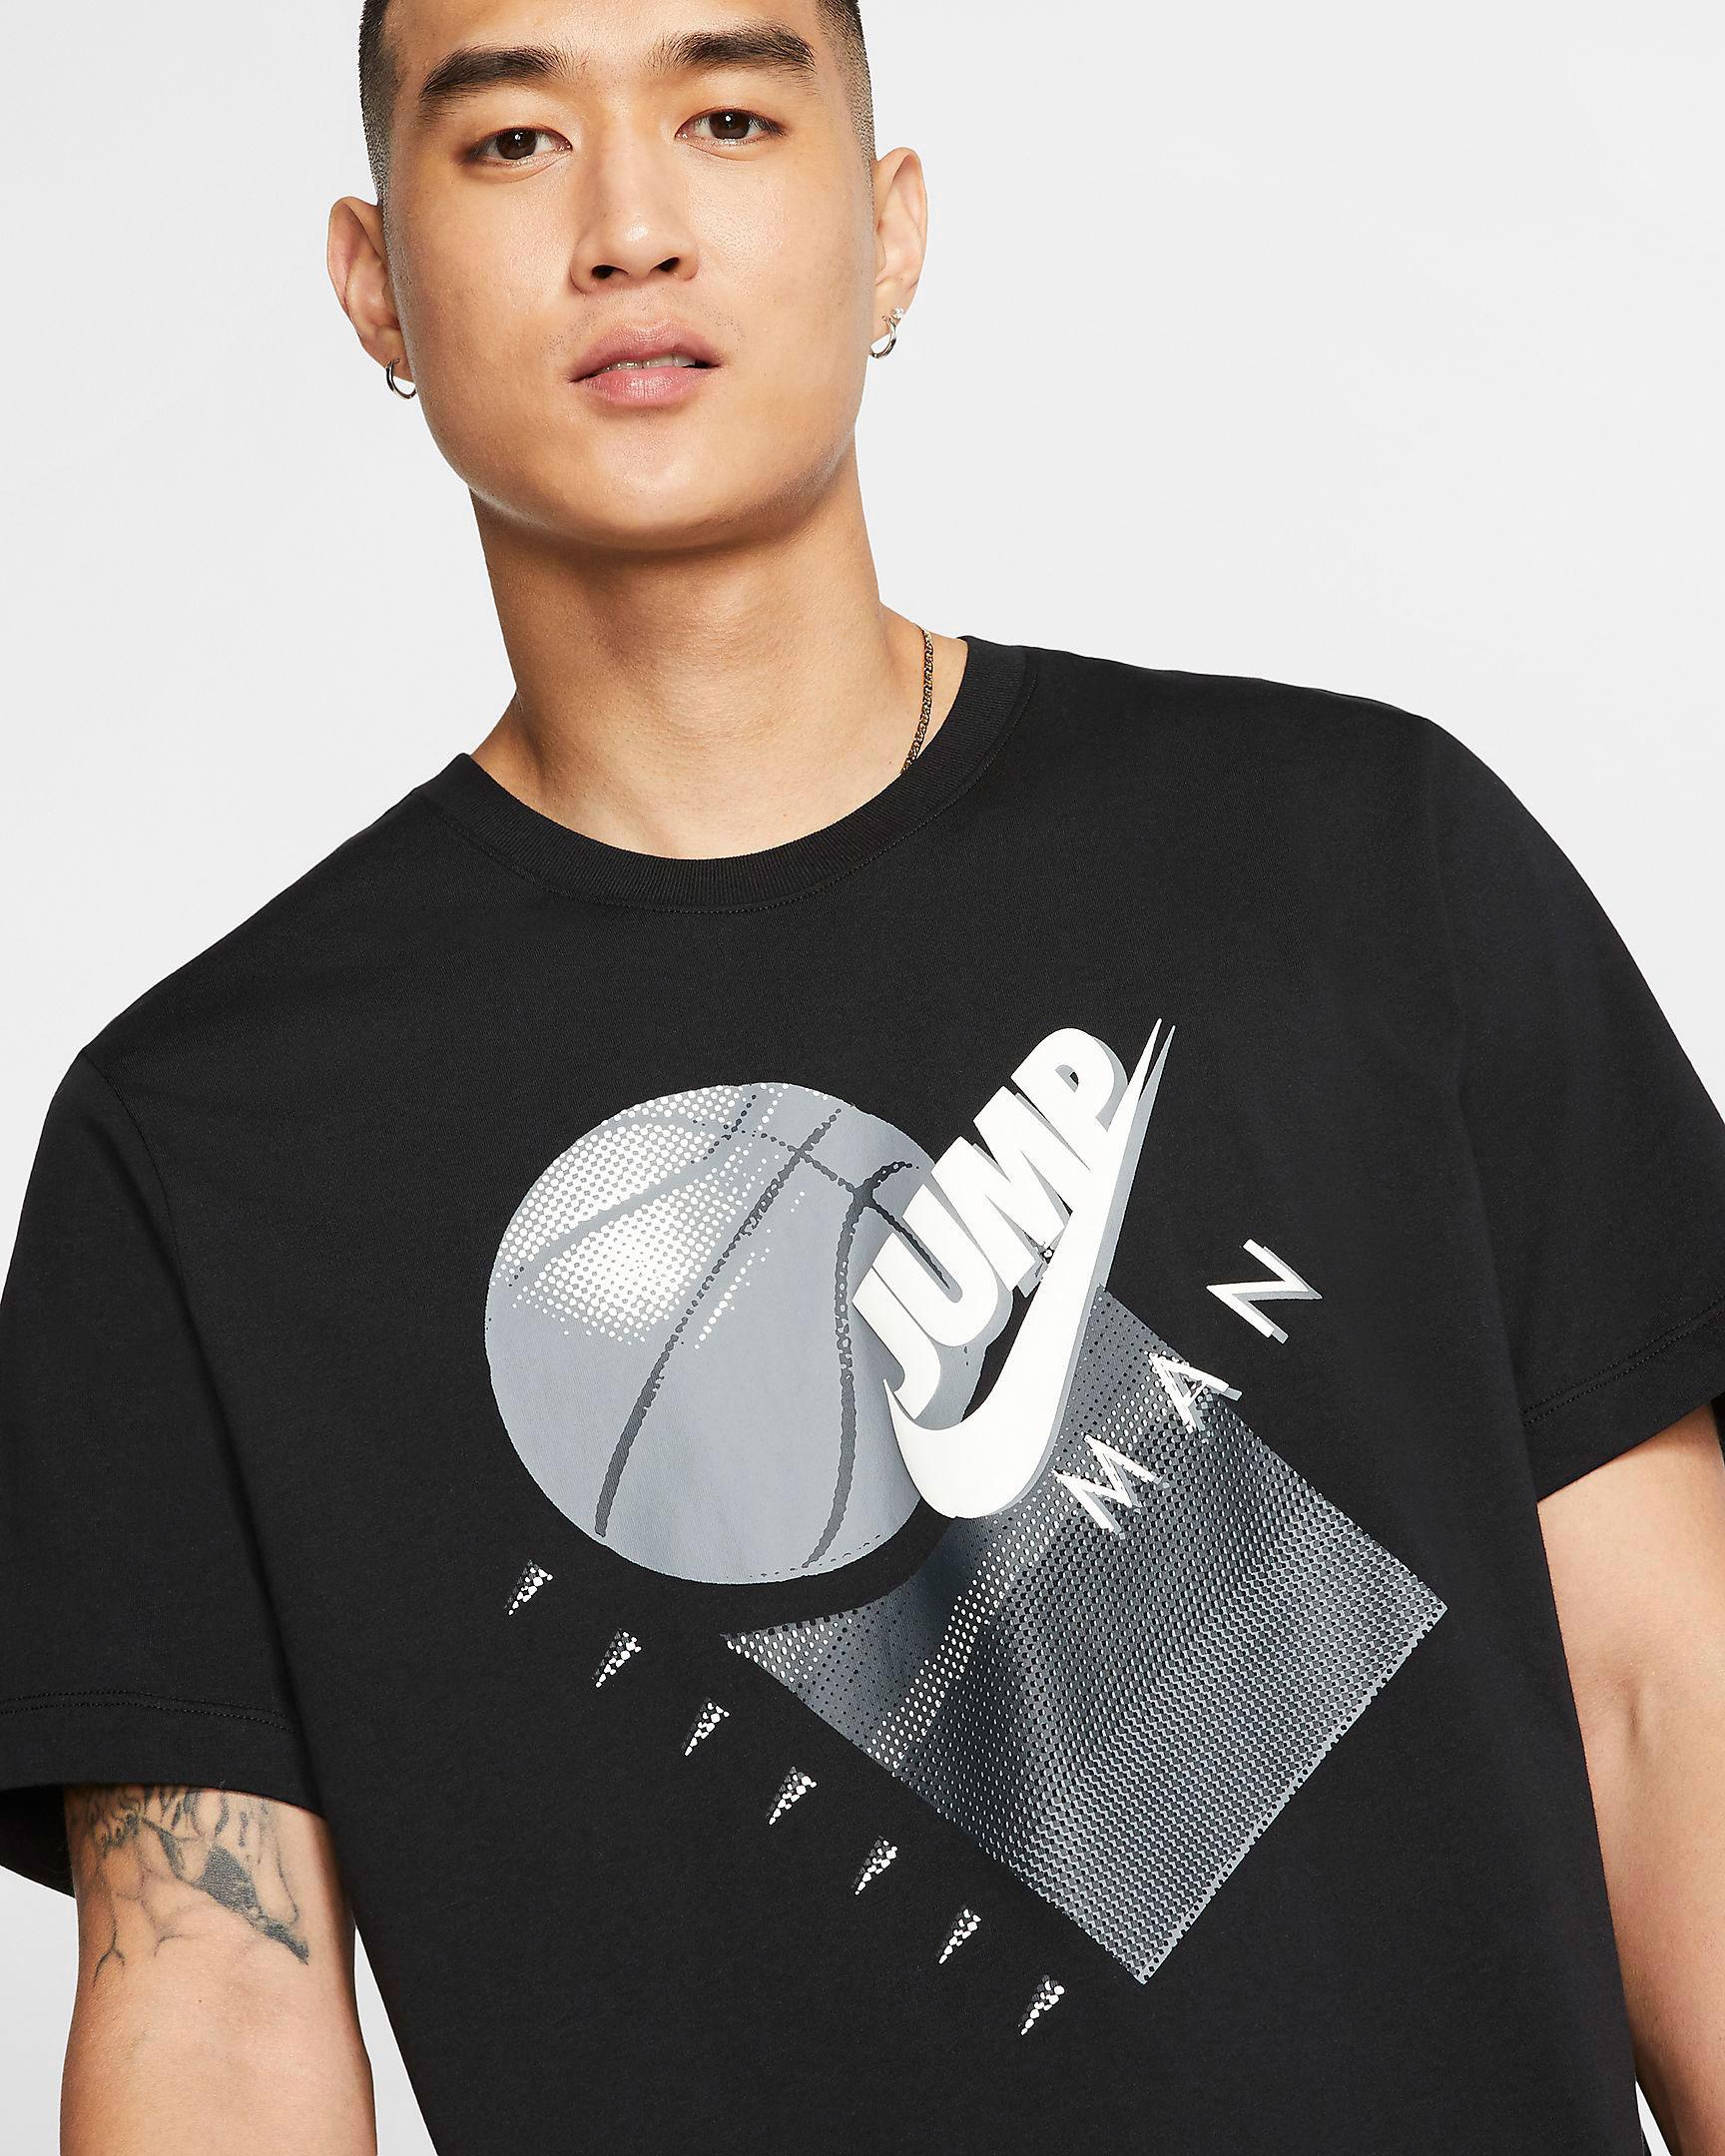 jordan-11-low-black-cement-shirt-match-2